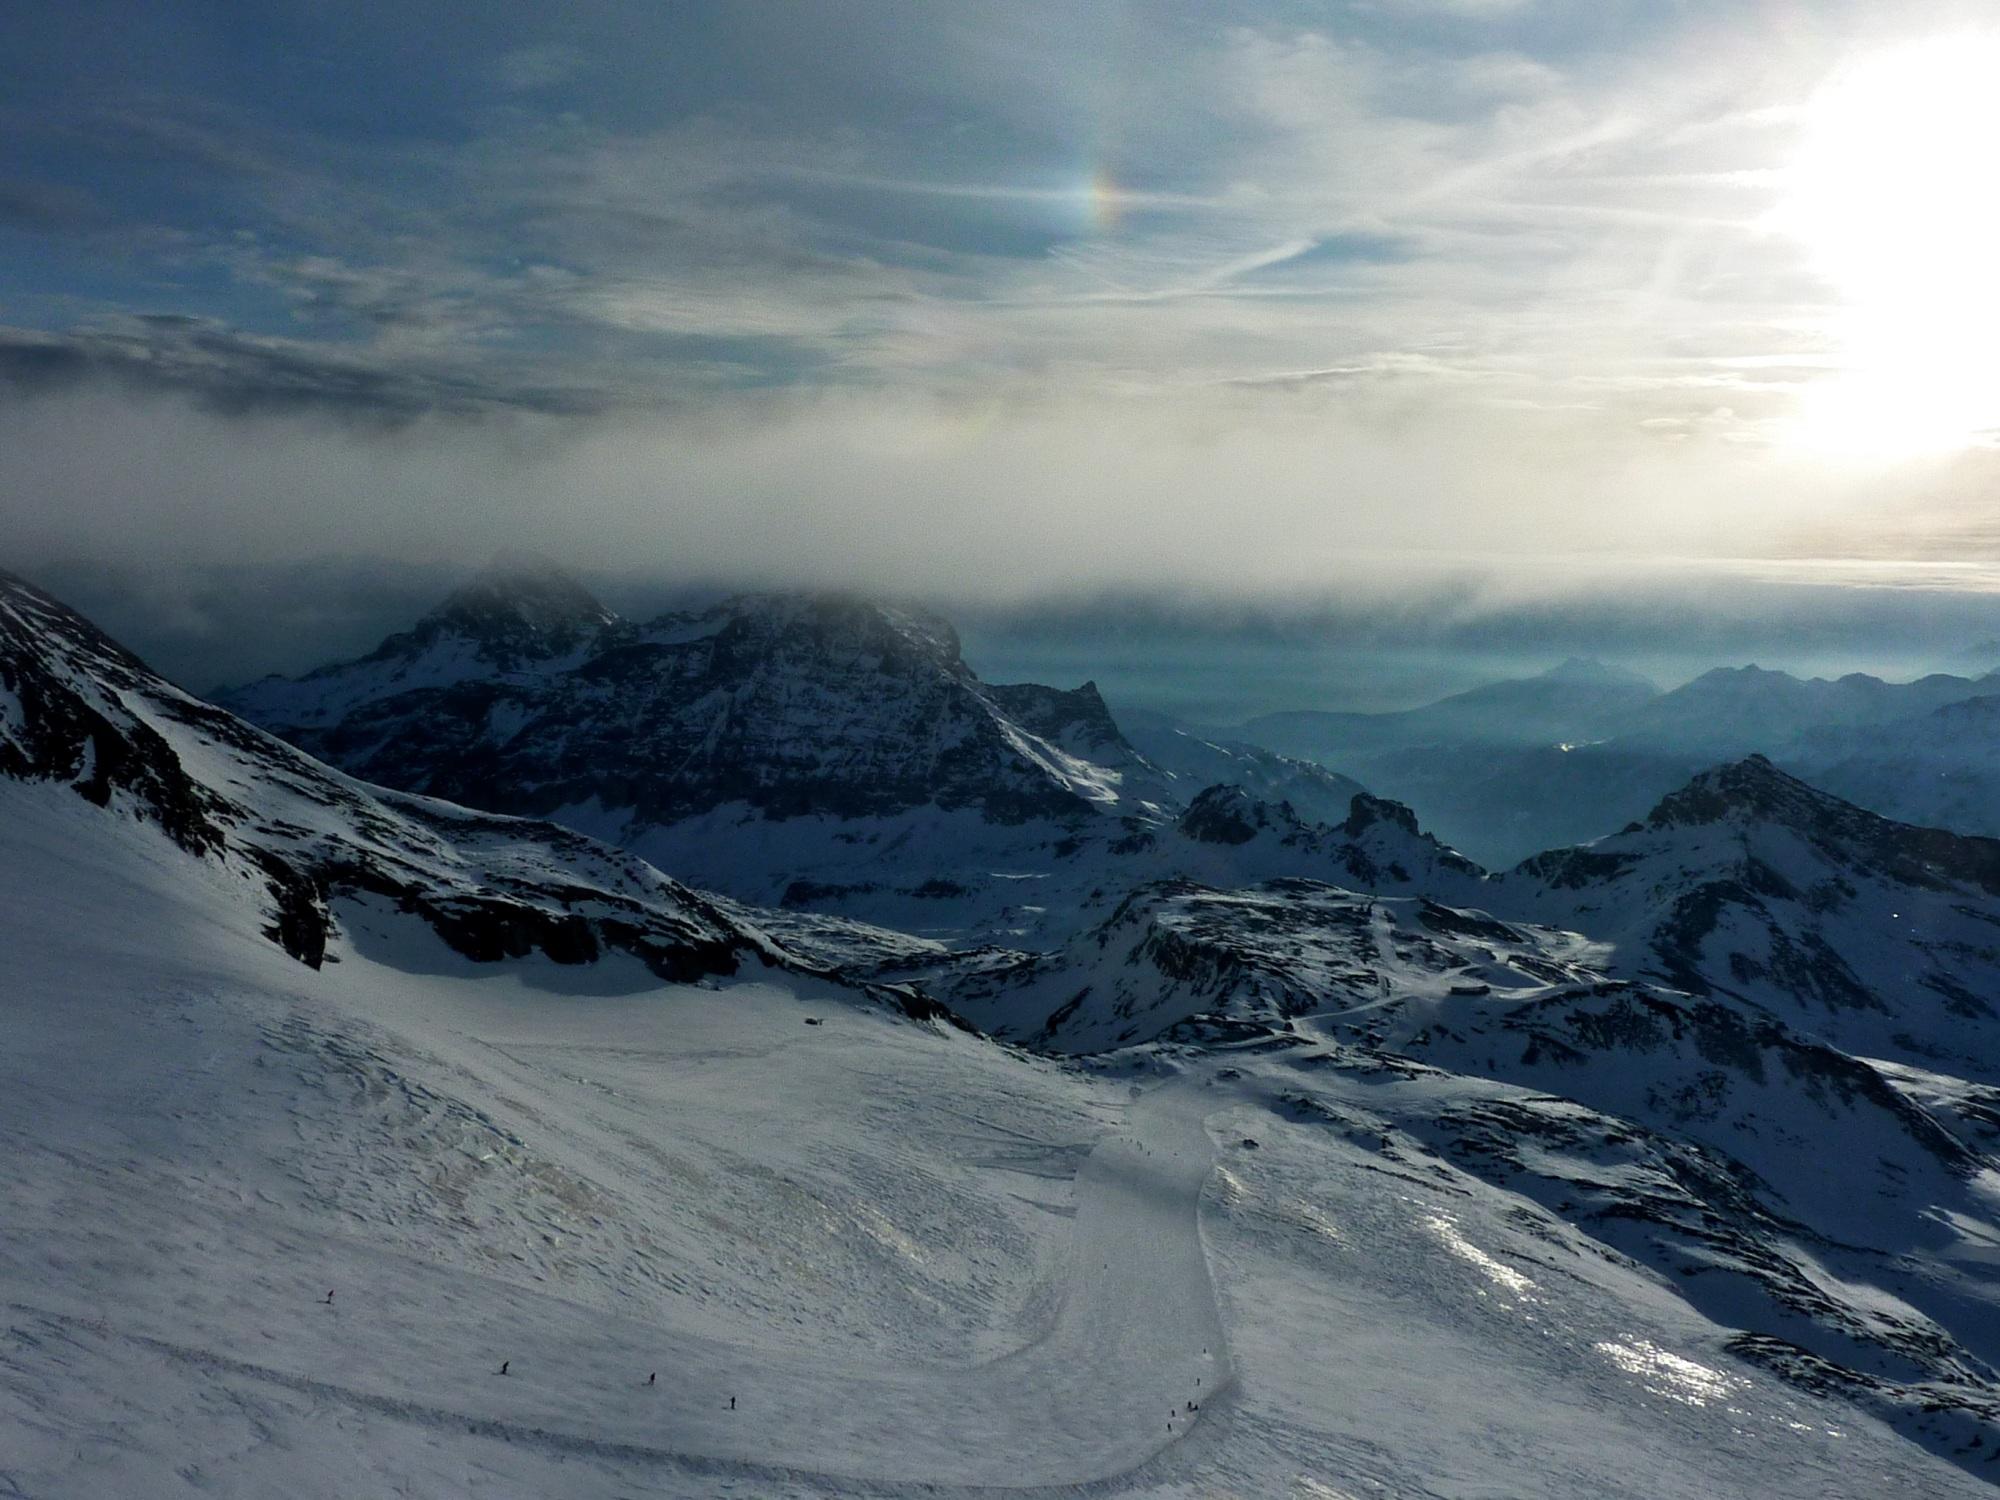 Cervinia - 3500m high